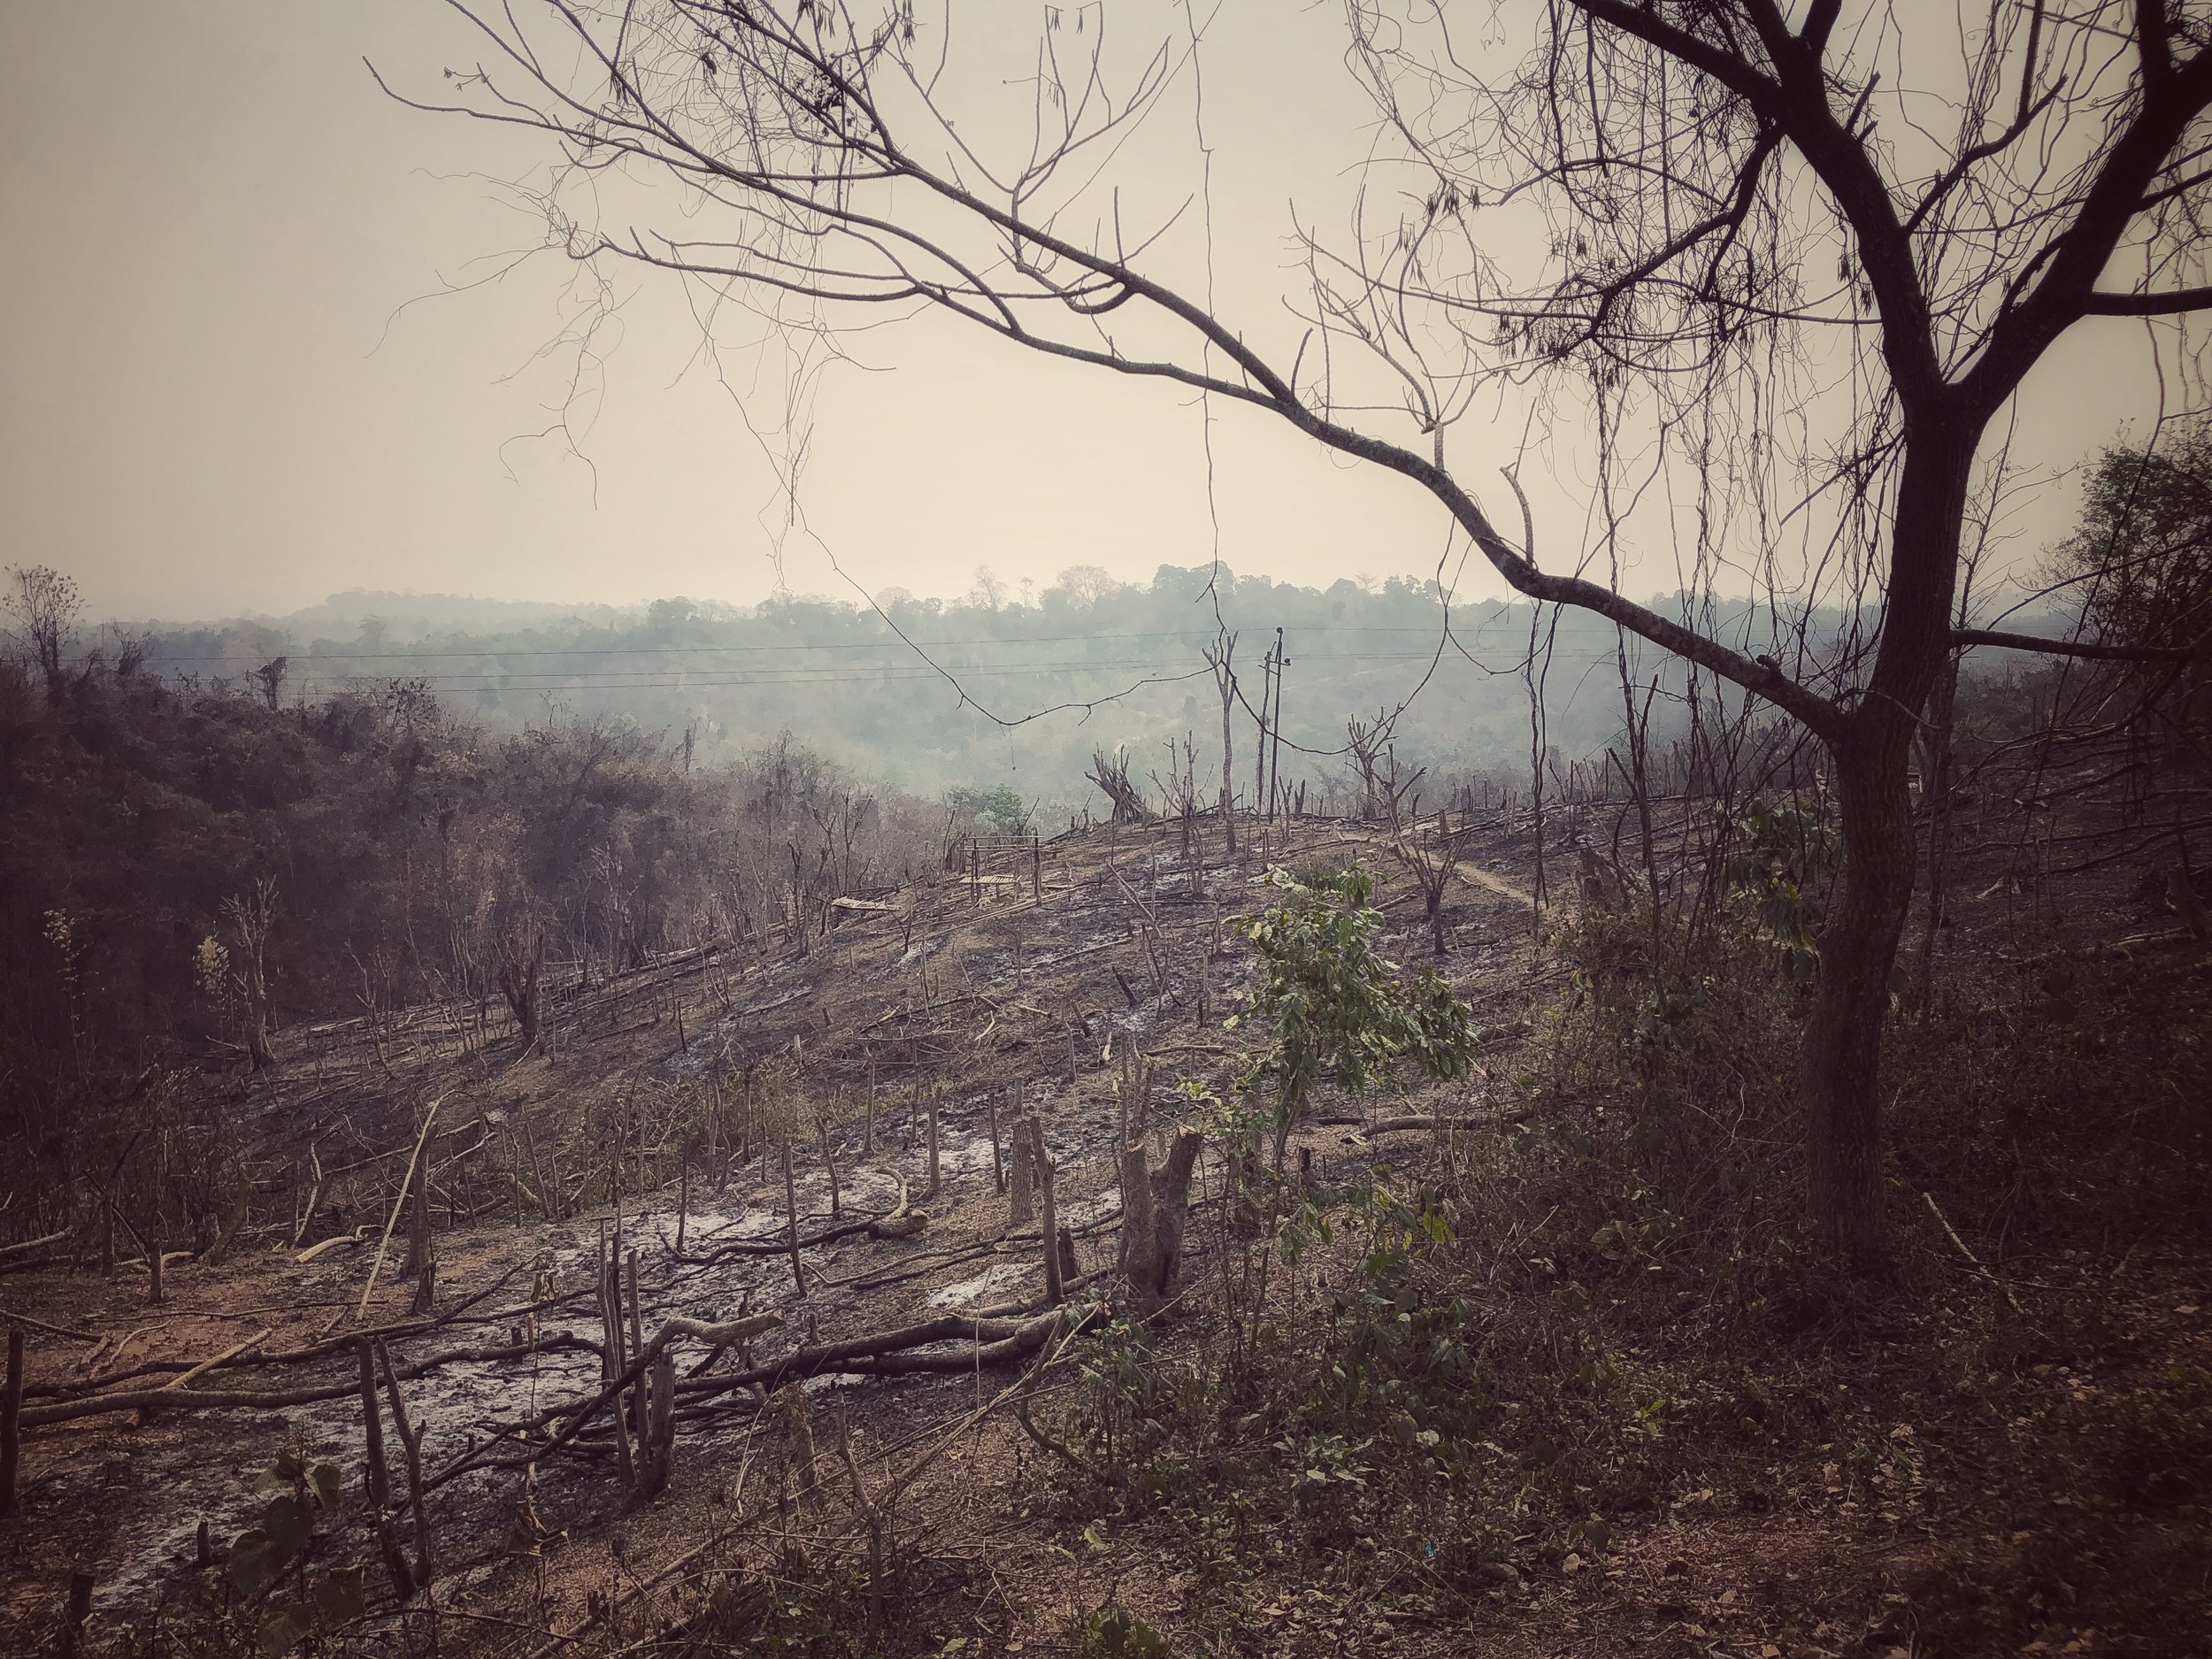 Jhumming (slash-and-burn) farming is highly destructive to the natural environment